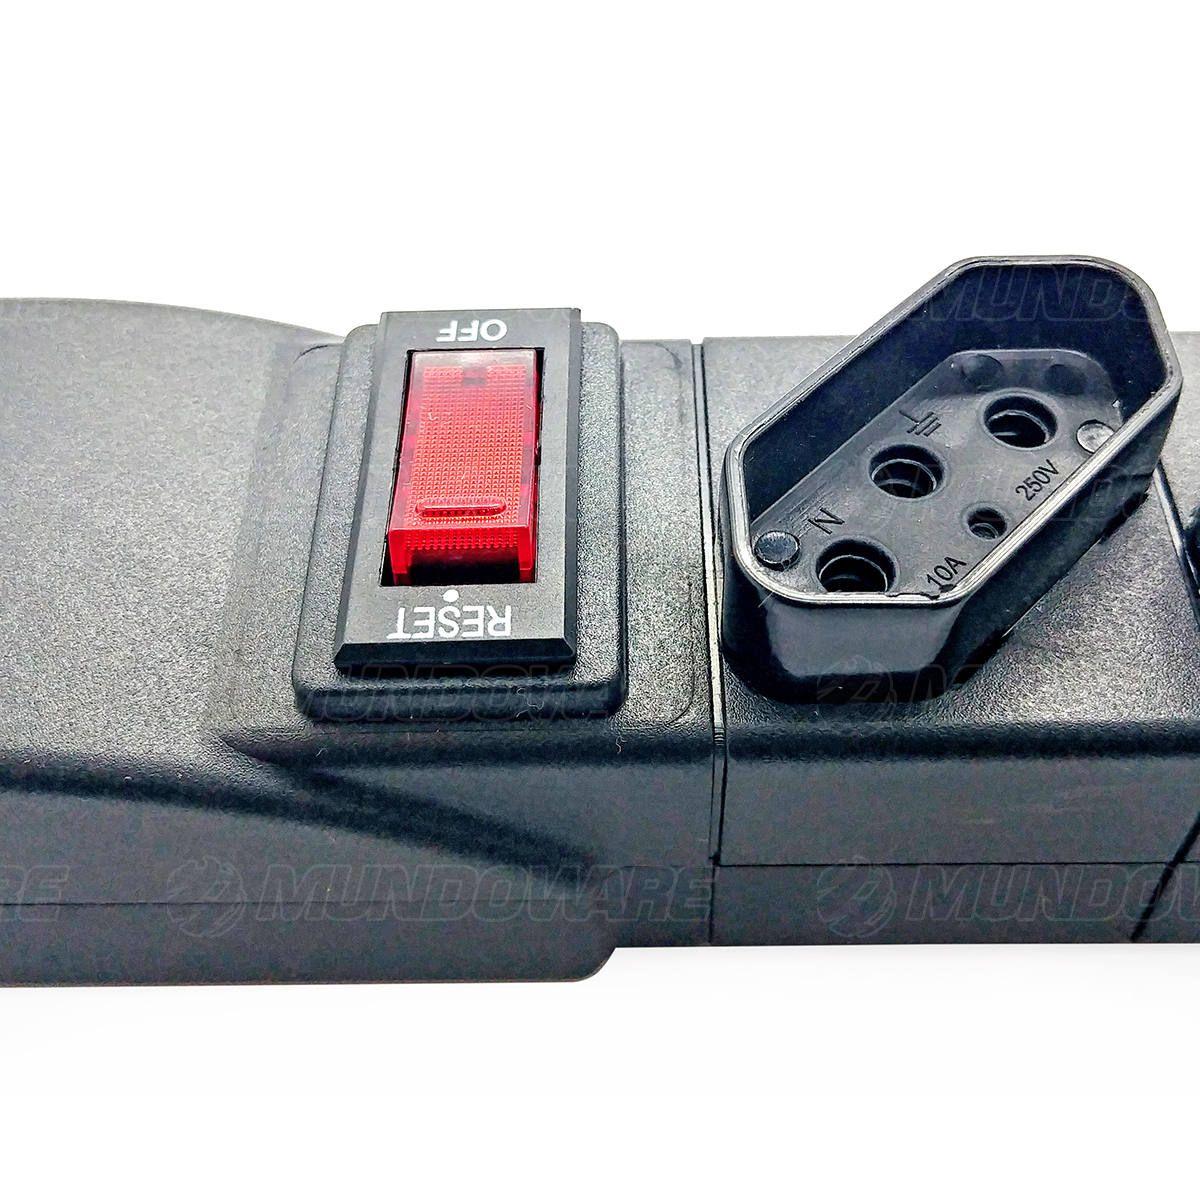 Régua de Energia Bivolt 8 Tomadas 10A Cabo 5 Metros Desarme Automático Chave Disjuntora Reset/Off Emplac F50217